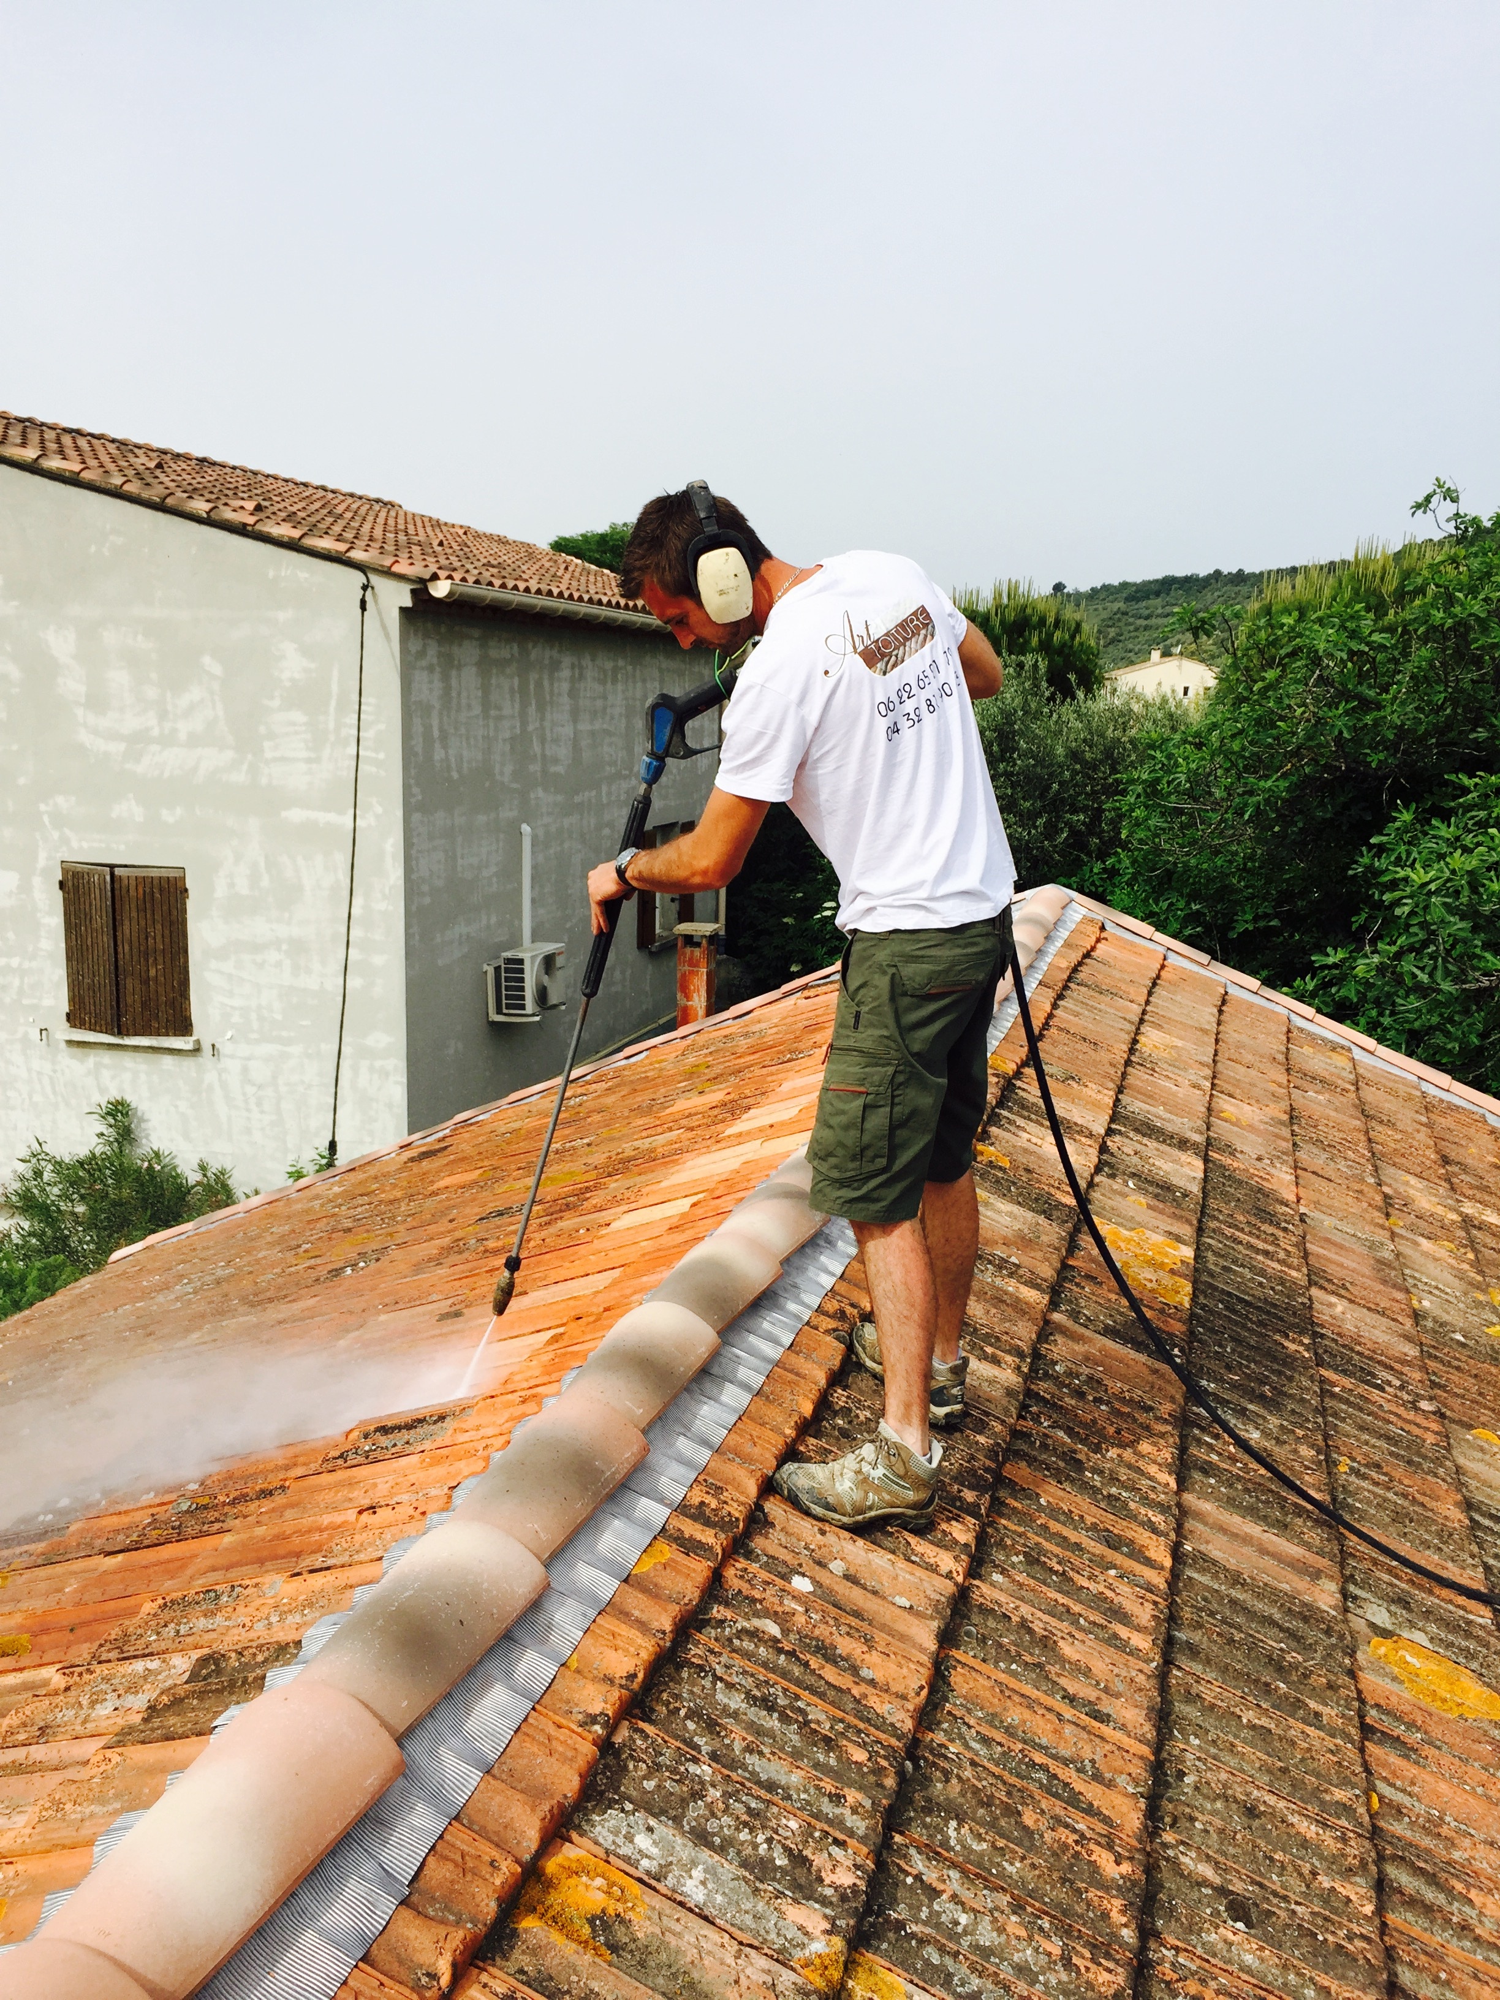 Traitement des tuiles nettoyage toiture Avignon (84) Orange Carpentras